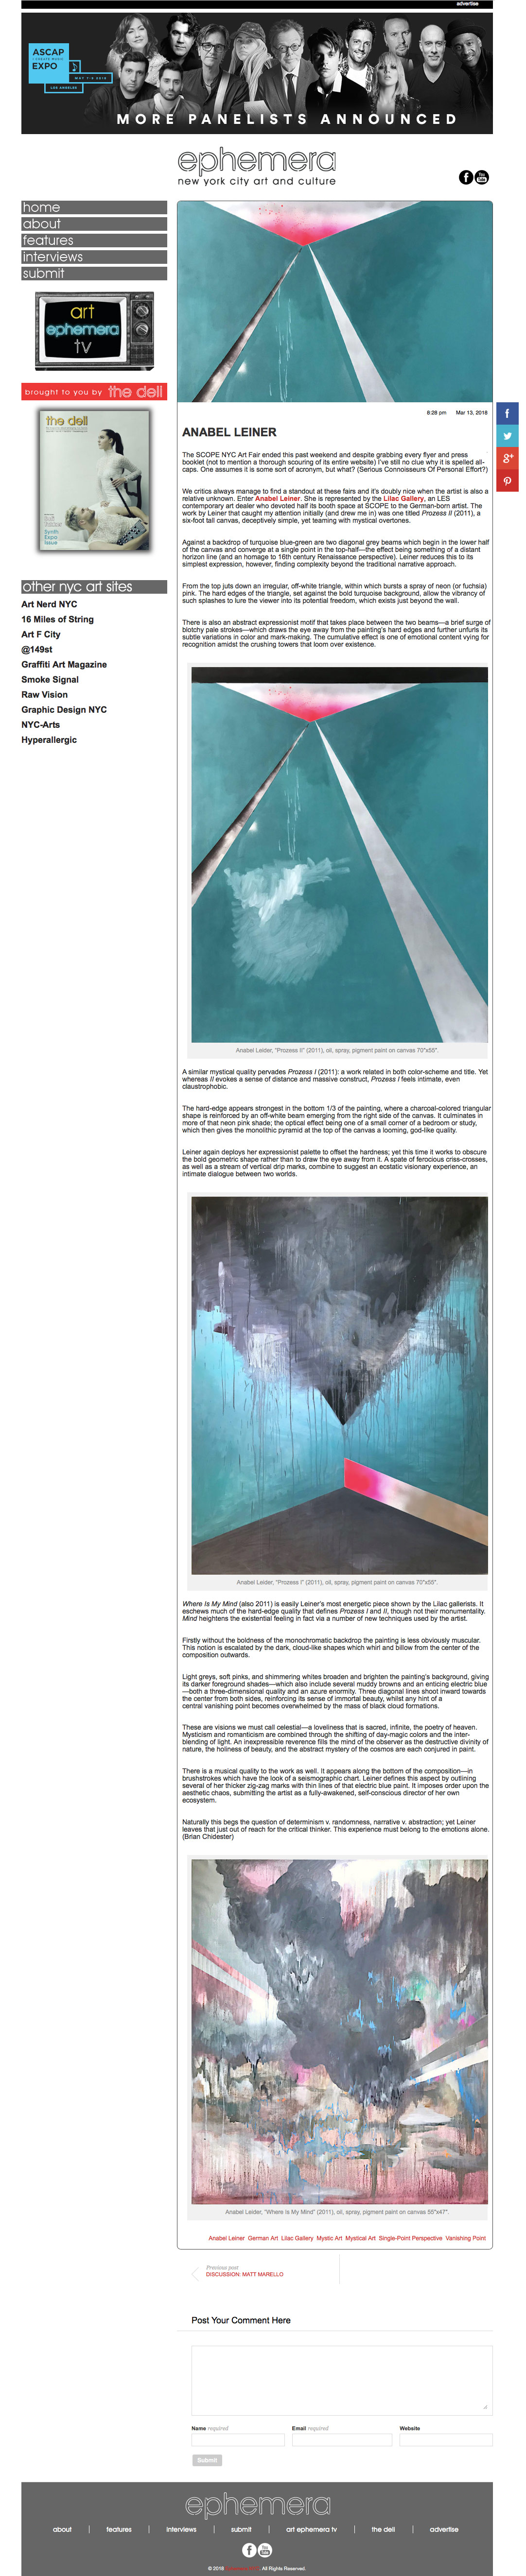 ephemera-new-york-city-art-and-culture-ANABEL-LEINER.jpg